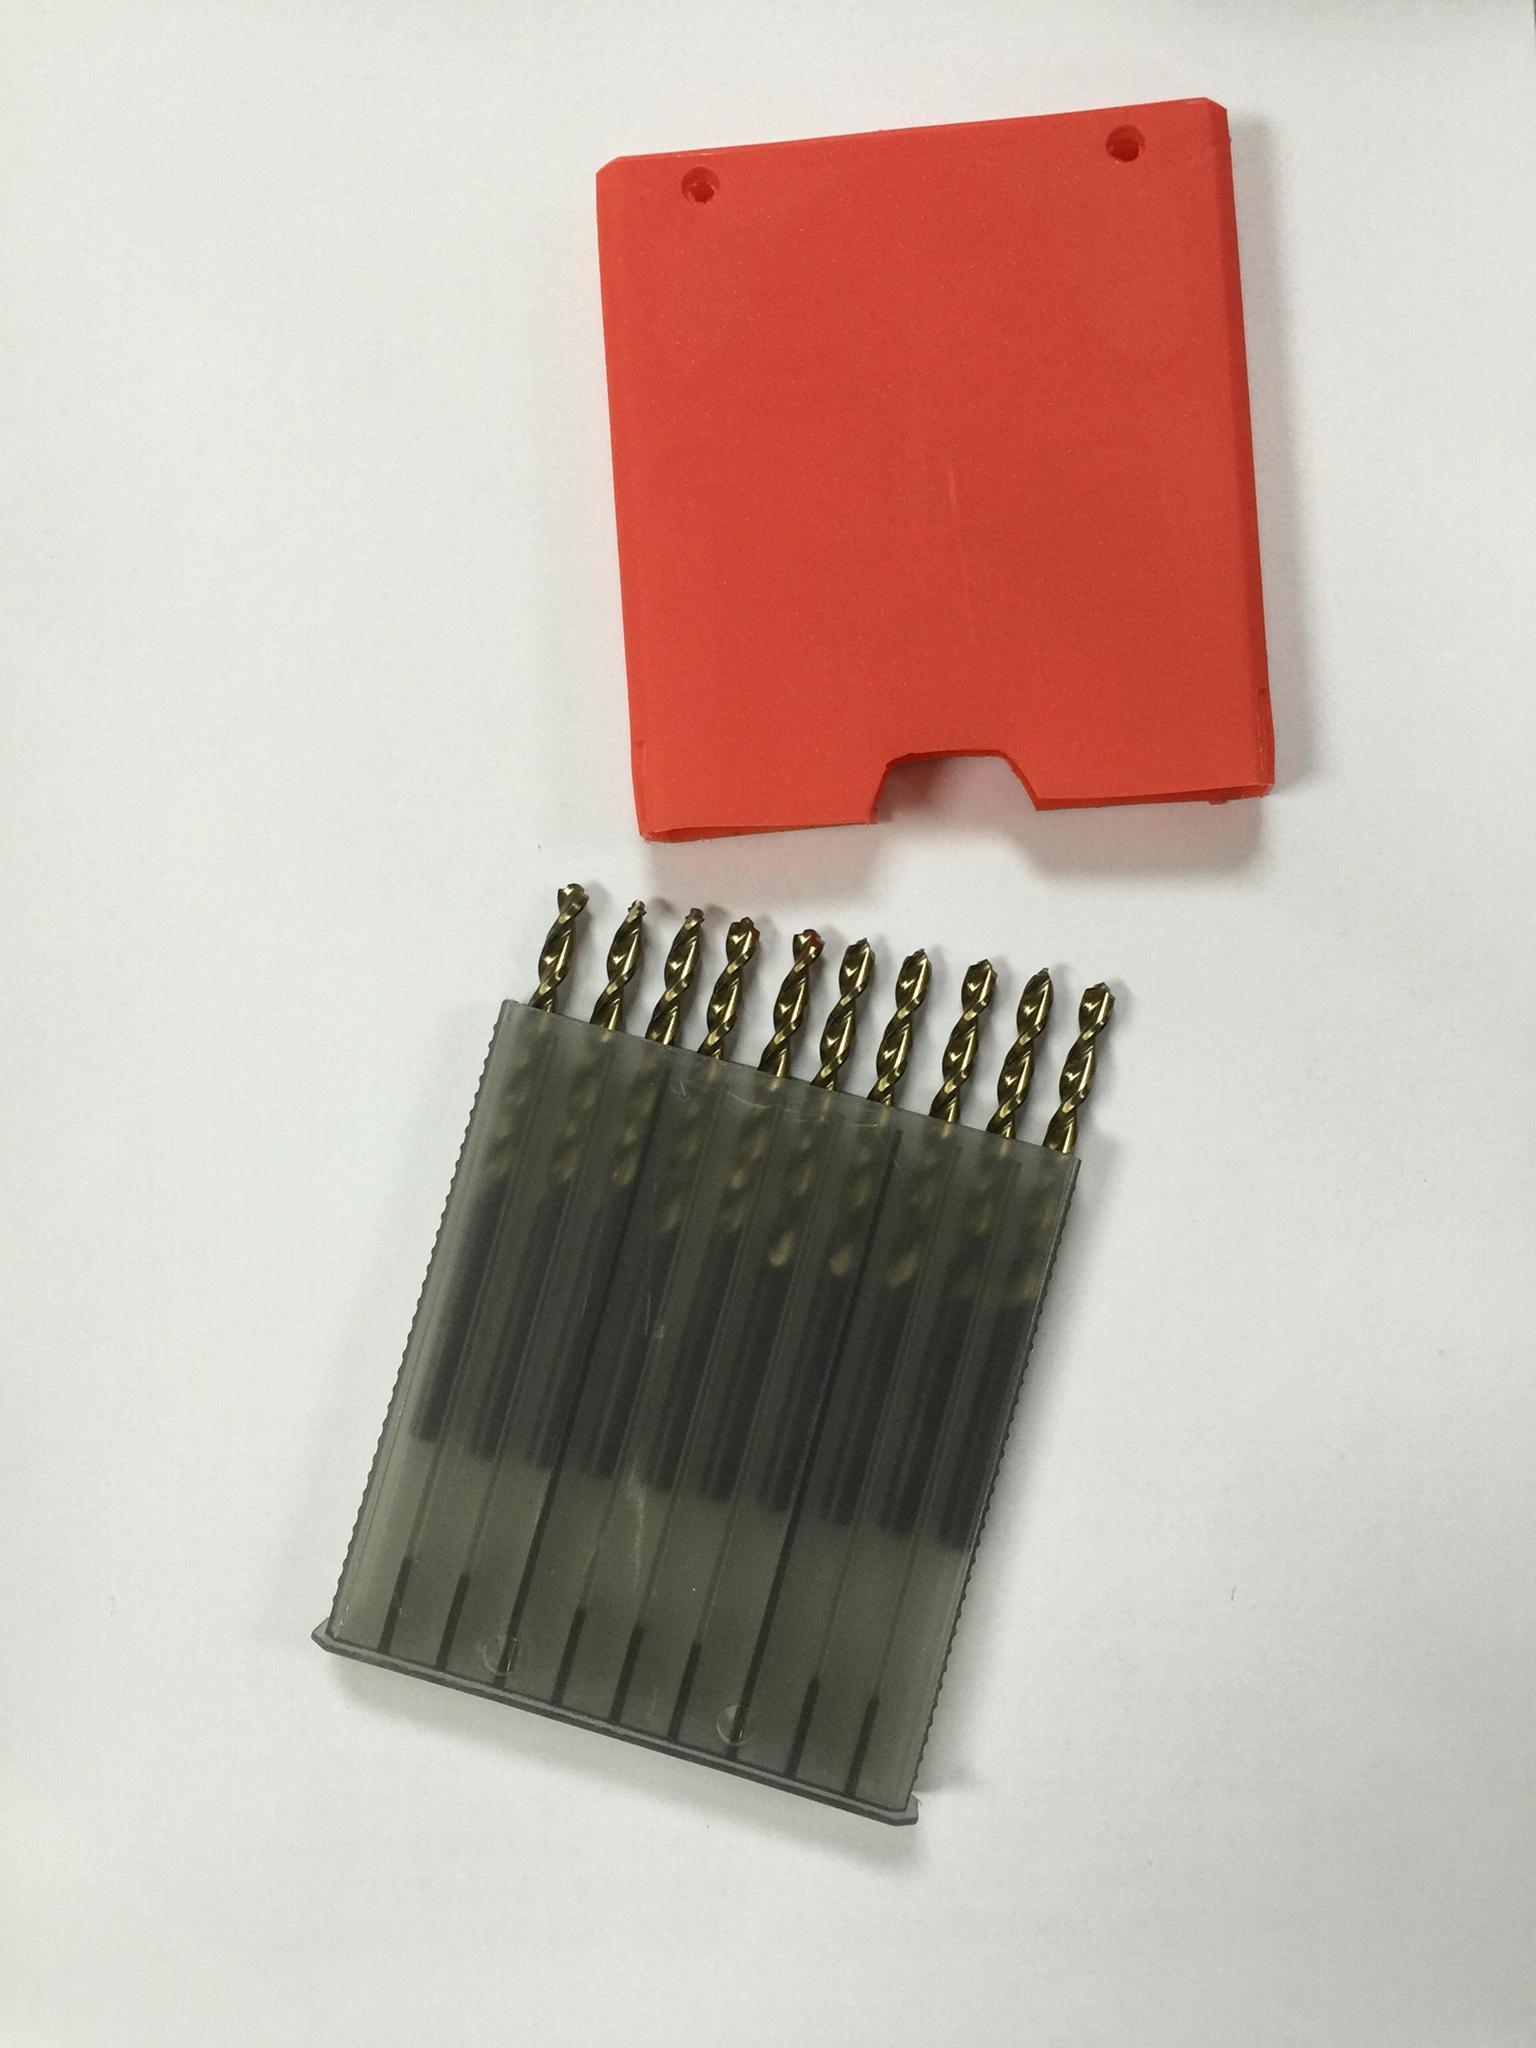 Multifork drills